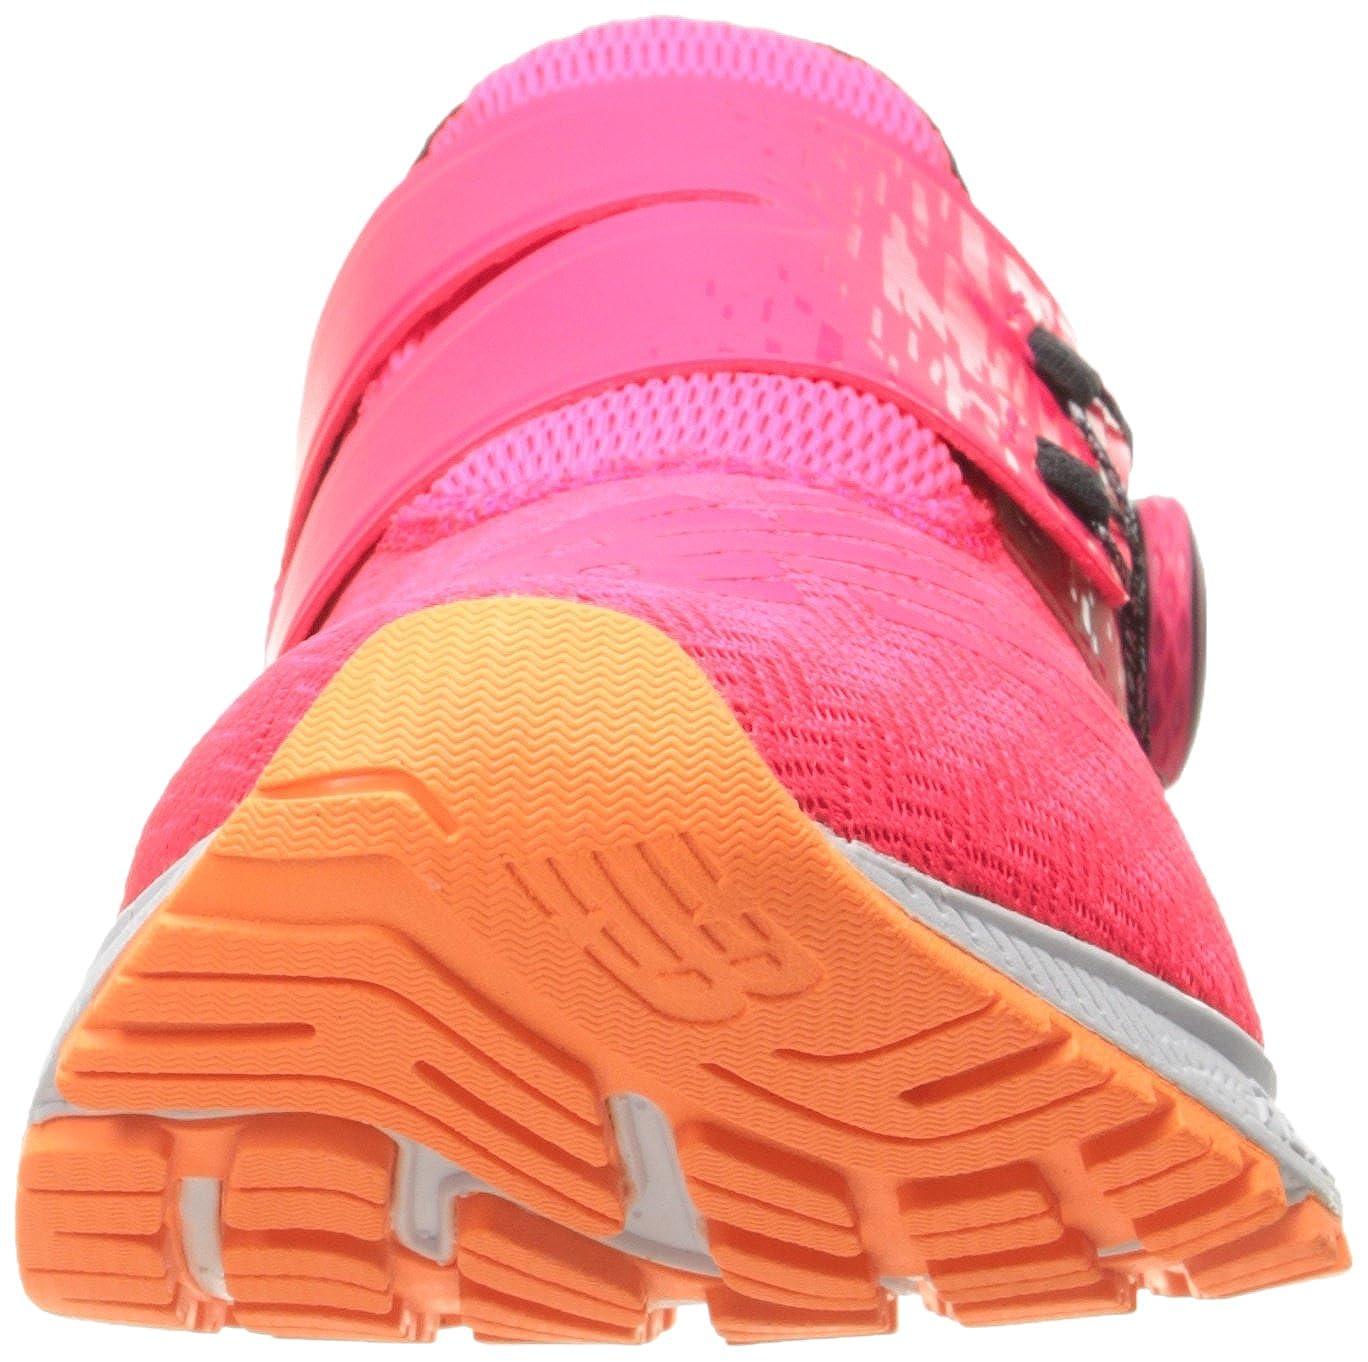 New Balance FuelCore Sonic, Zapatillas de Atletismo para Mujer